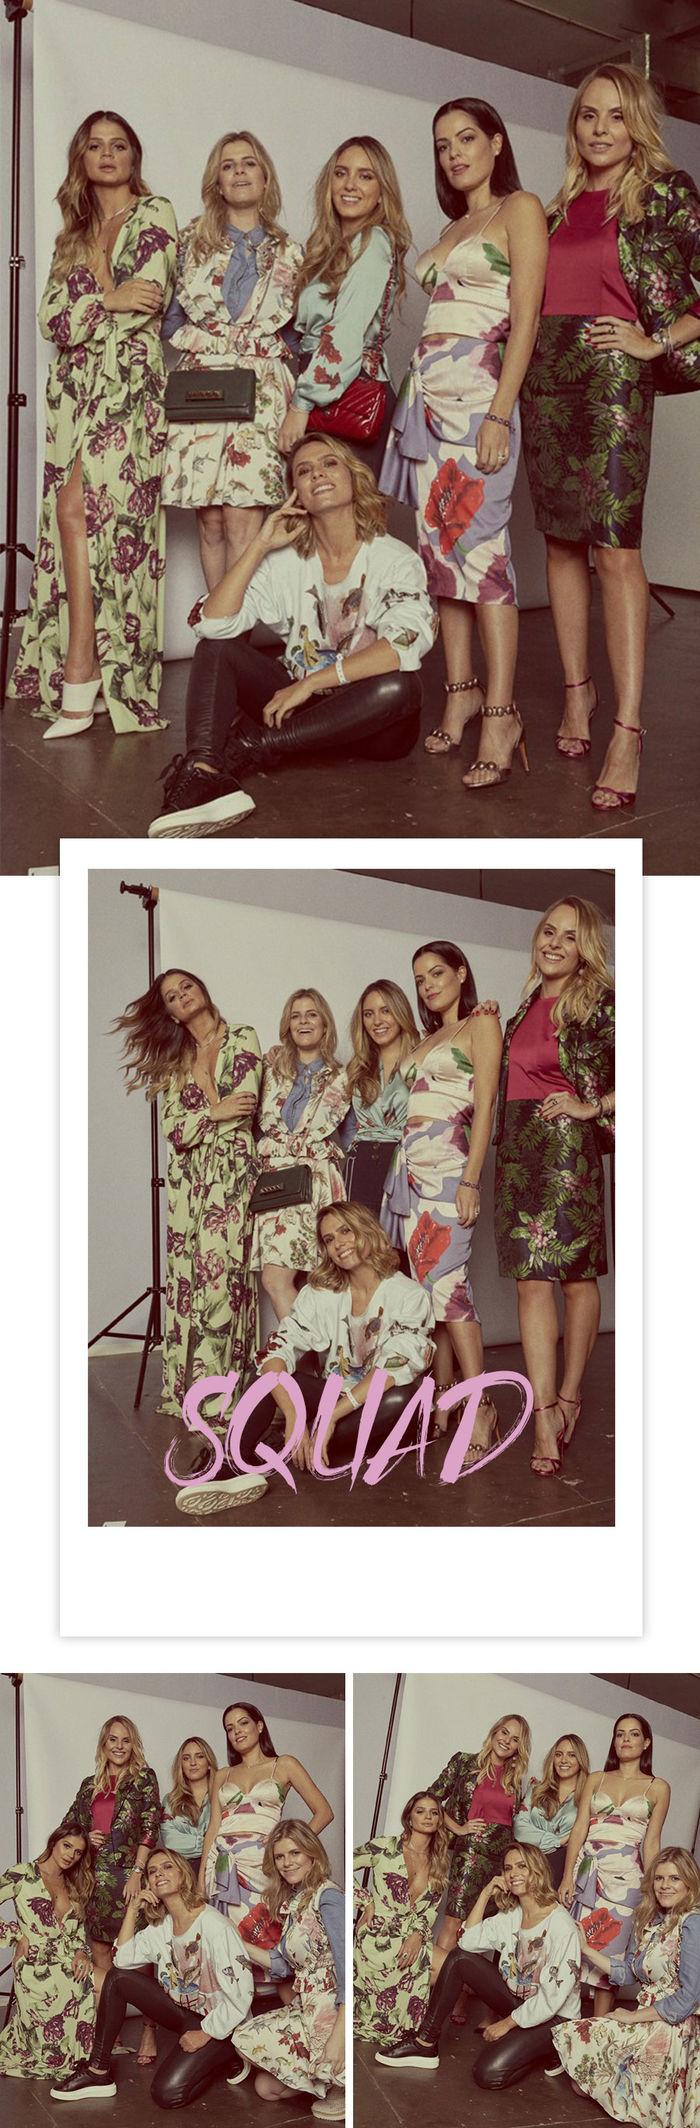 Squad PatBo para Glamour Thássia Naves Patrícia Bonaldi